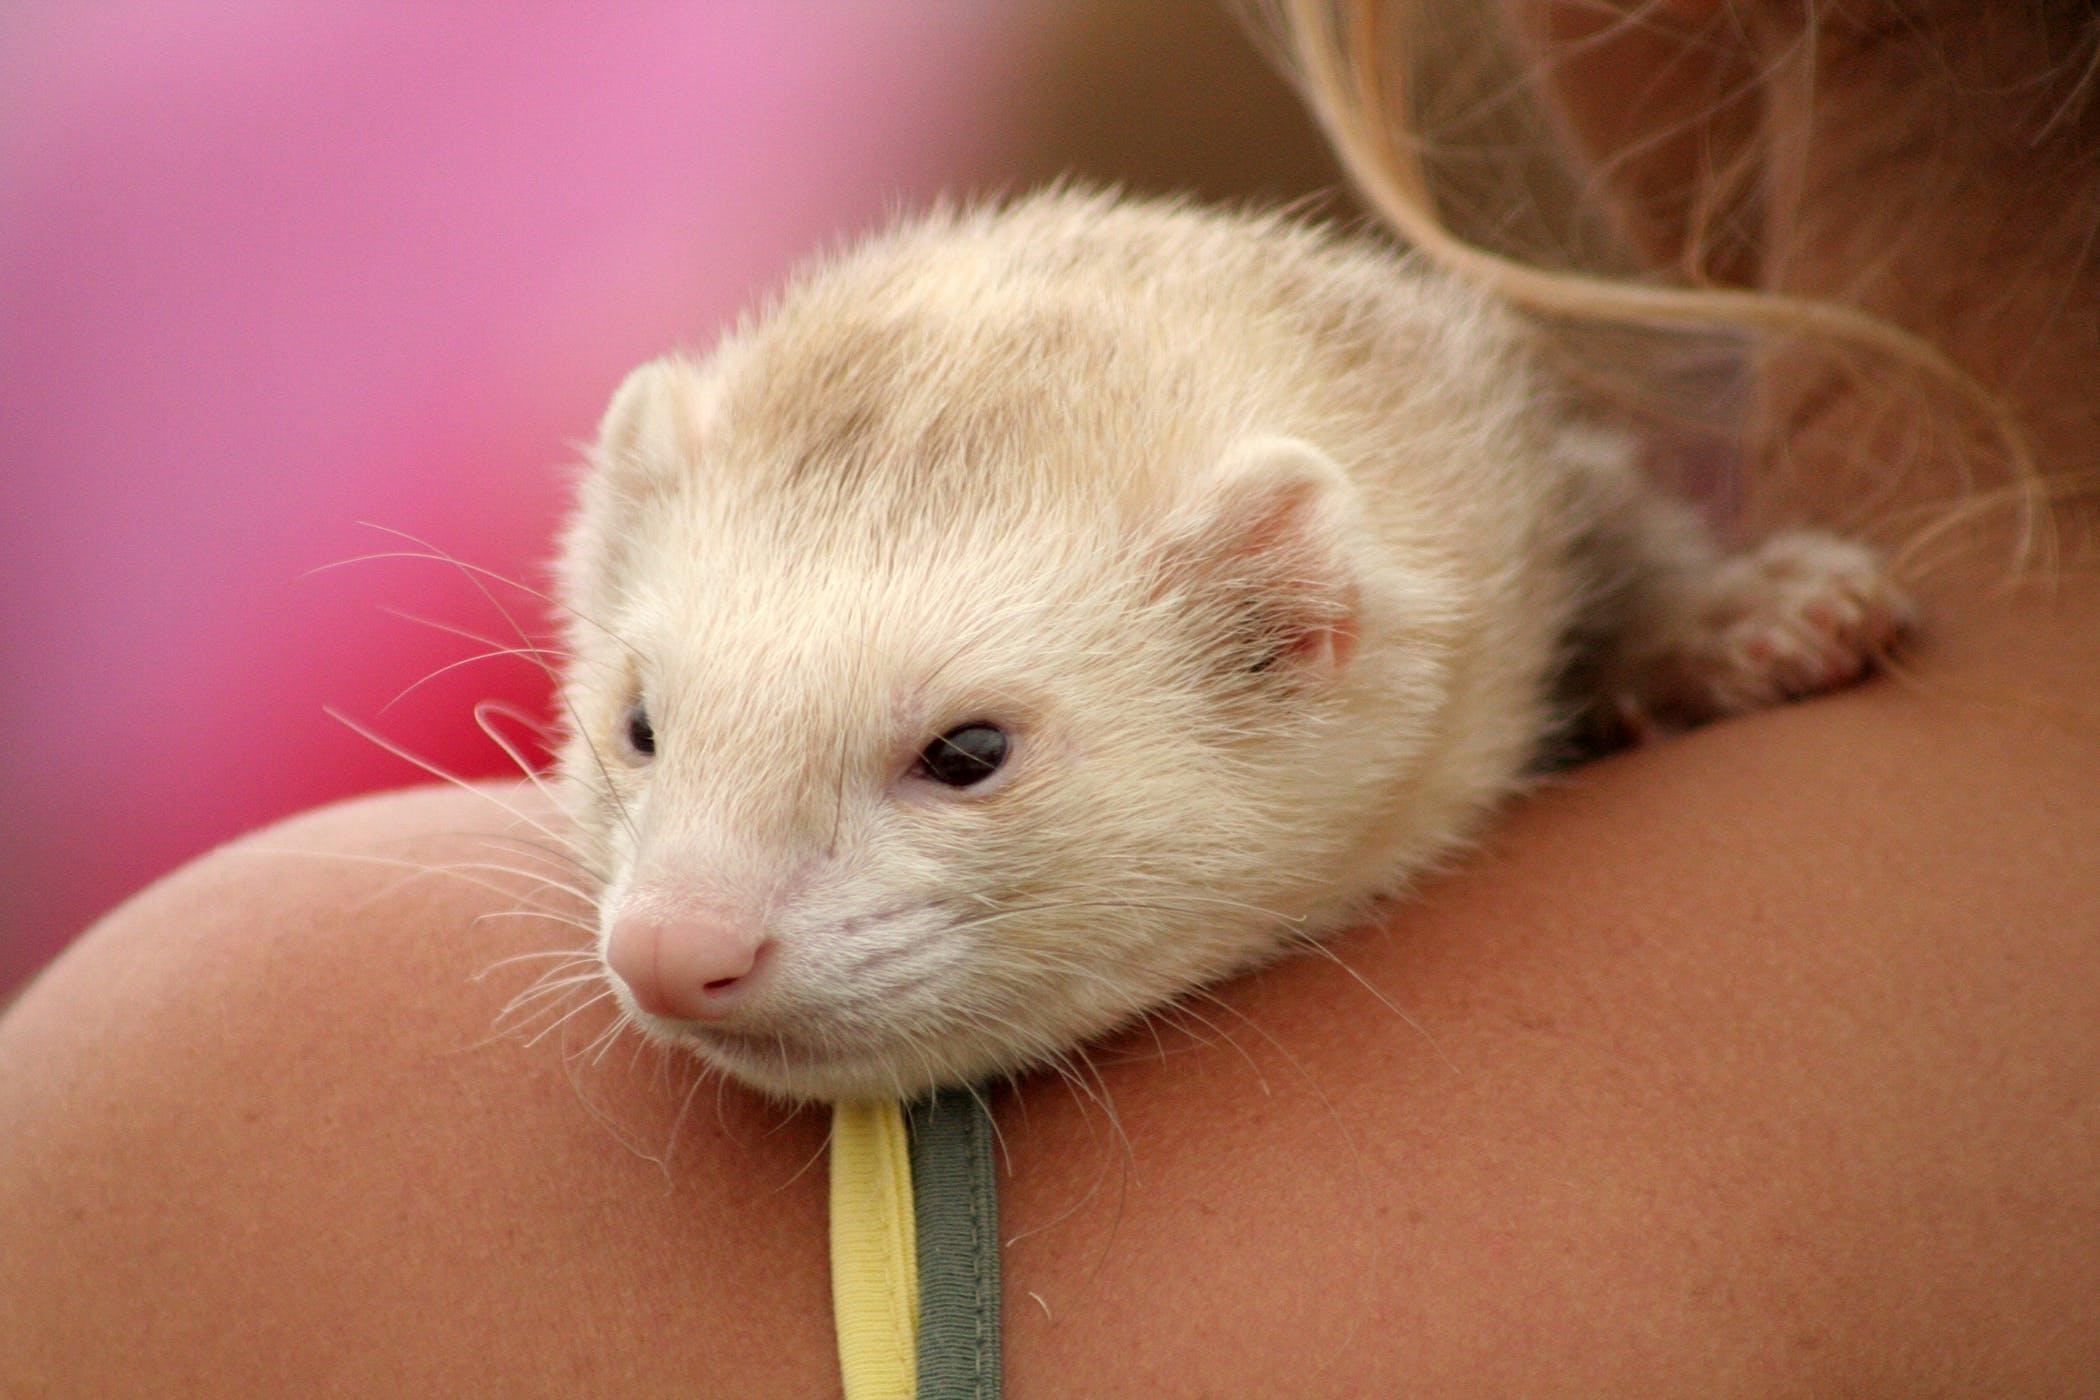 Overproduction of Estrogen in Ferrets - Symptoms, Causes